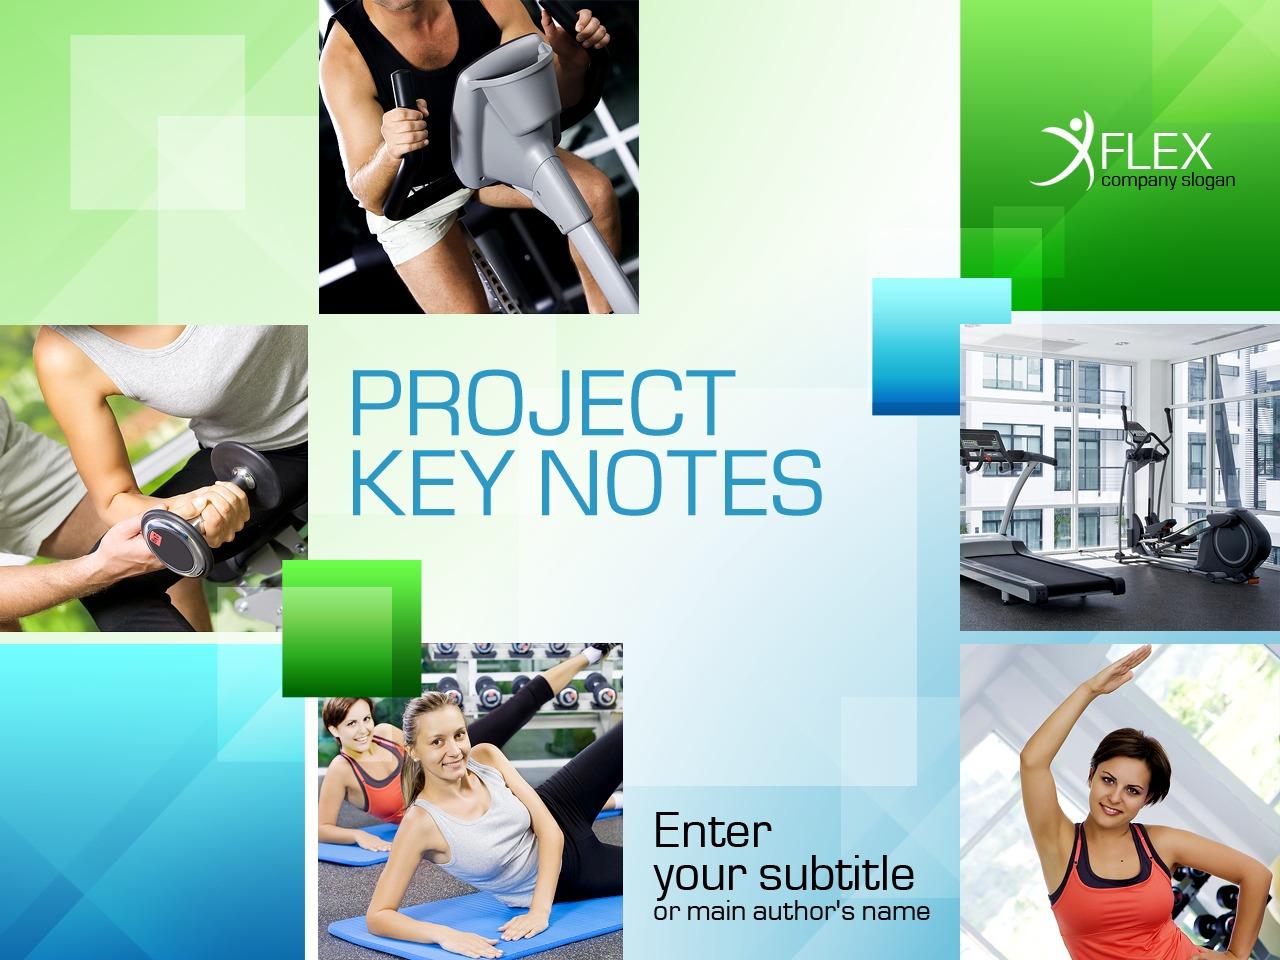 Szablon PowerPoint #33555 na temat: fitness